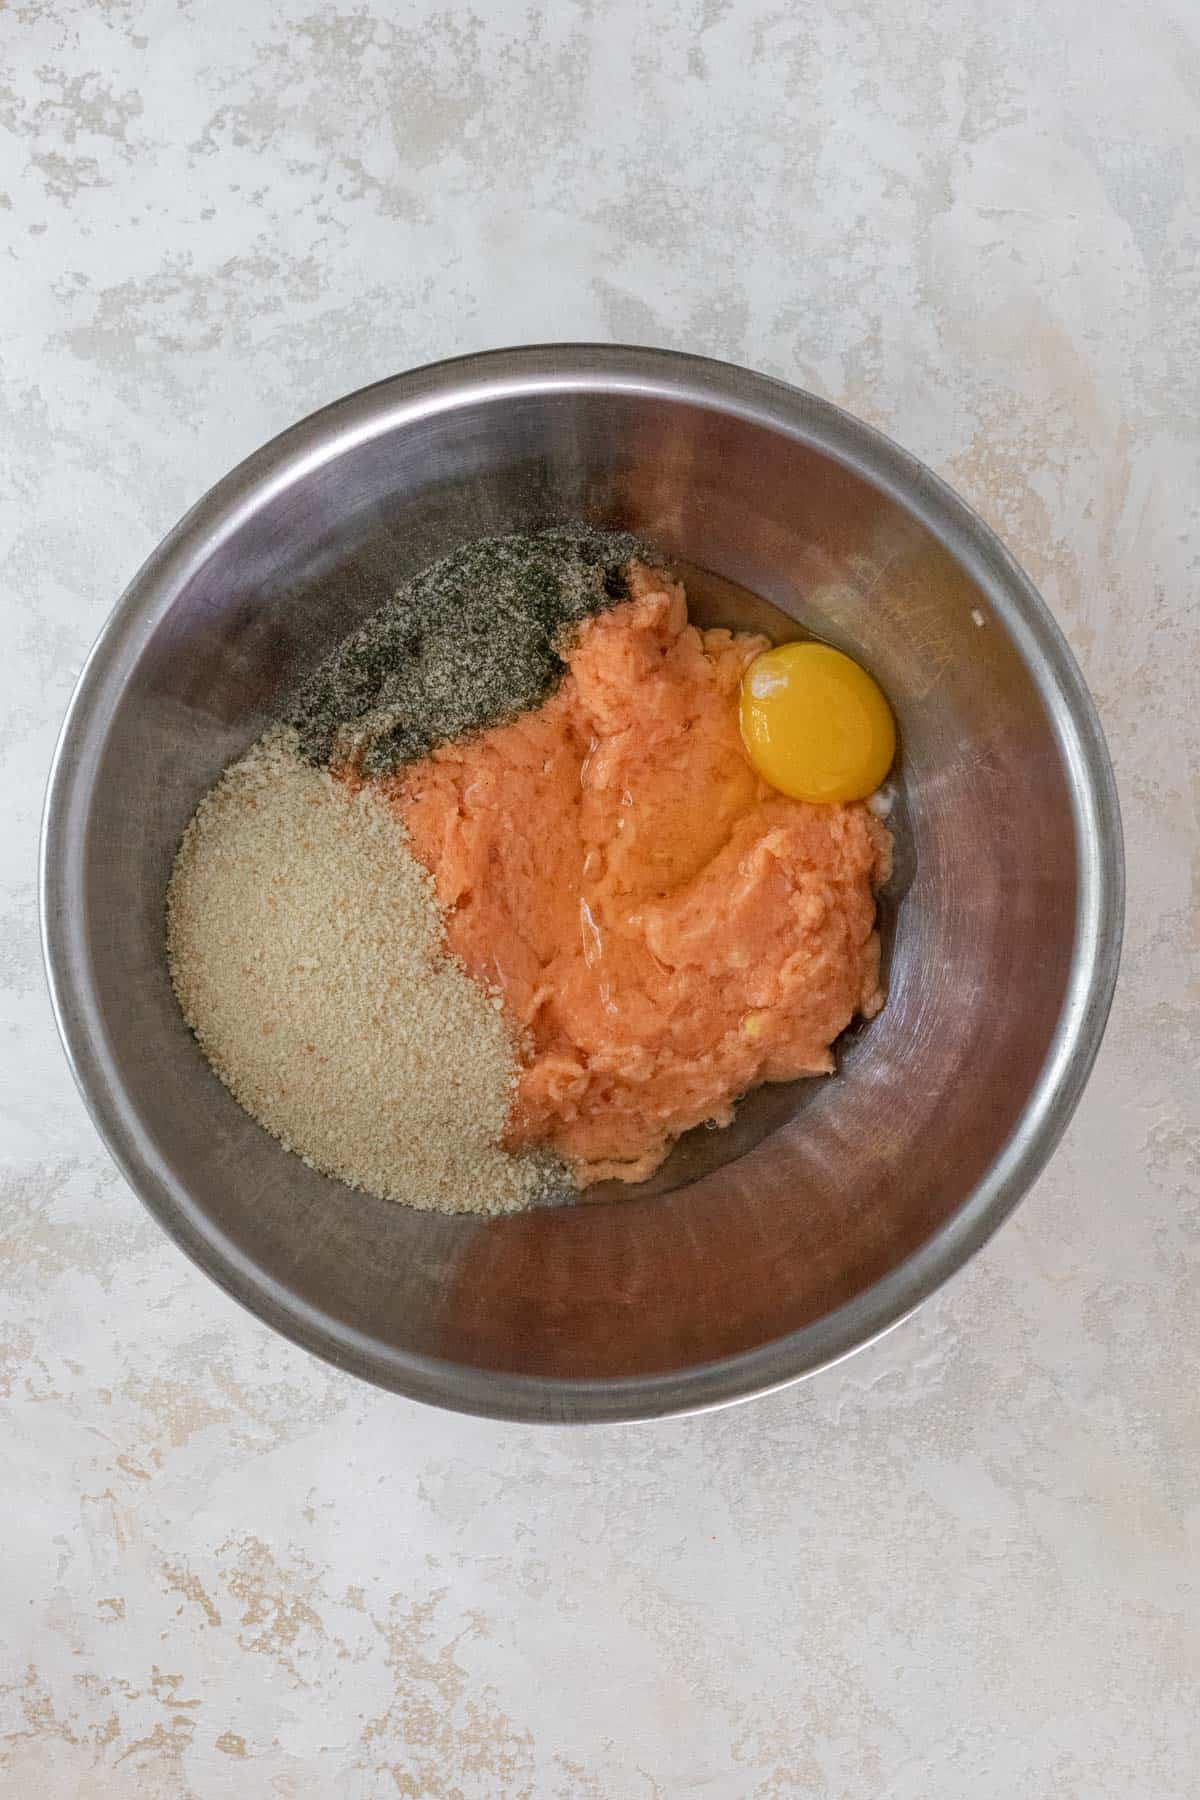 """Ground salmon"", egg, breadcrumbs, and seasonings in a metal mixing bowl."